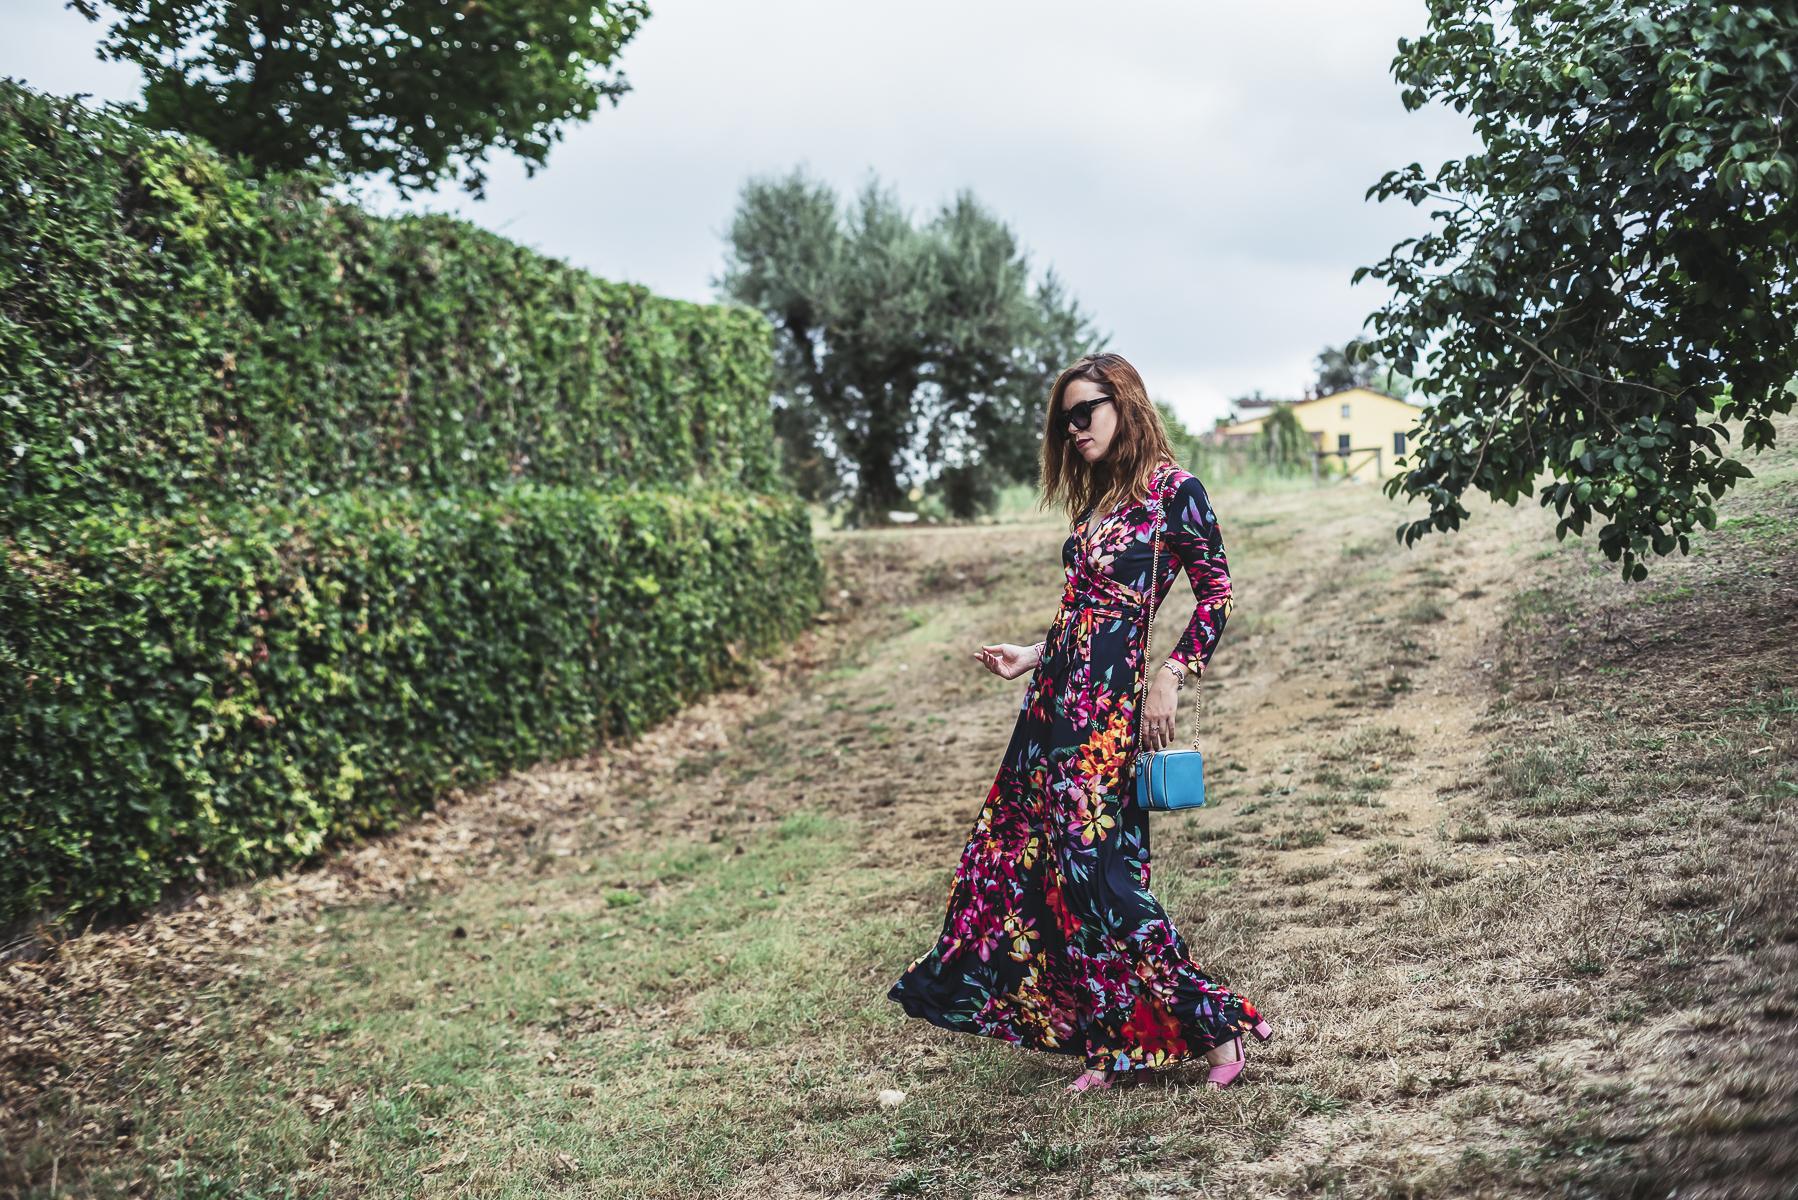 vestito floreale lungo ed estivo - long floral dress for summer